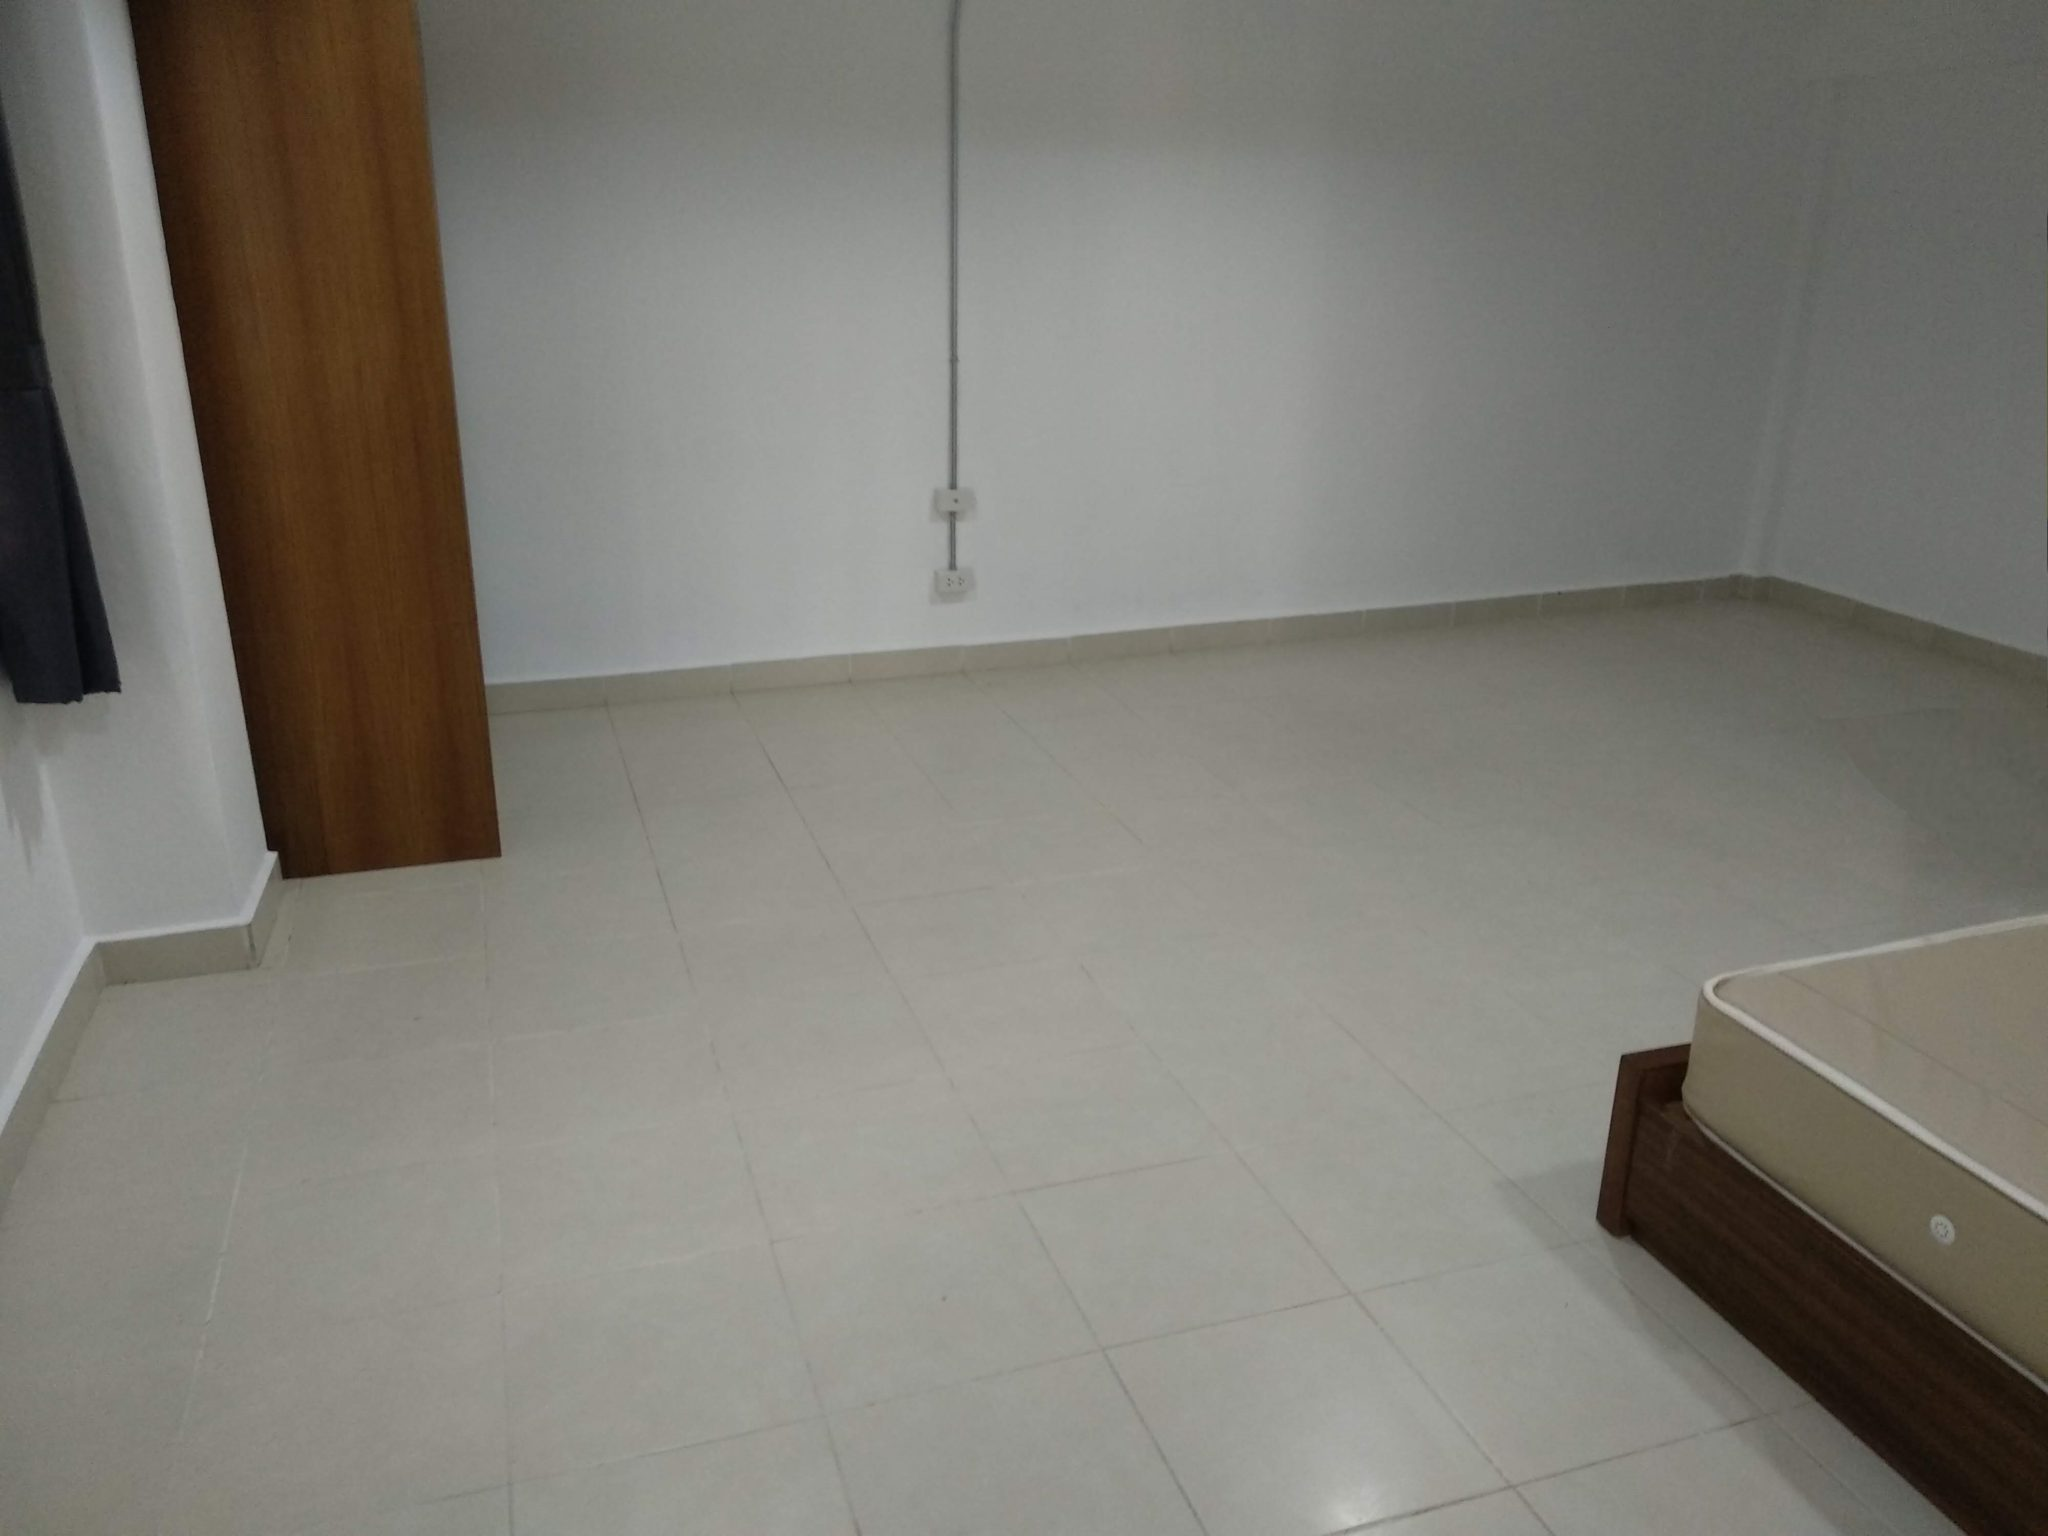 Large Room For Storage in Bangkok